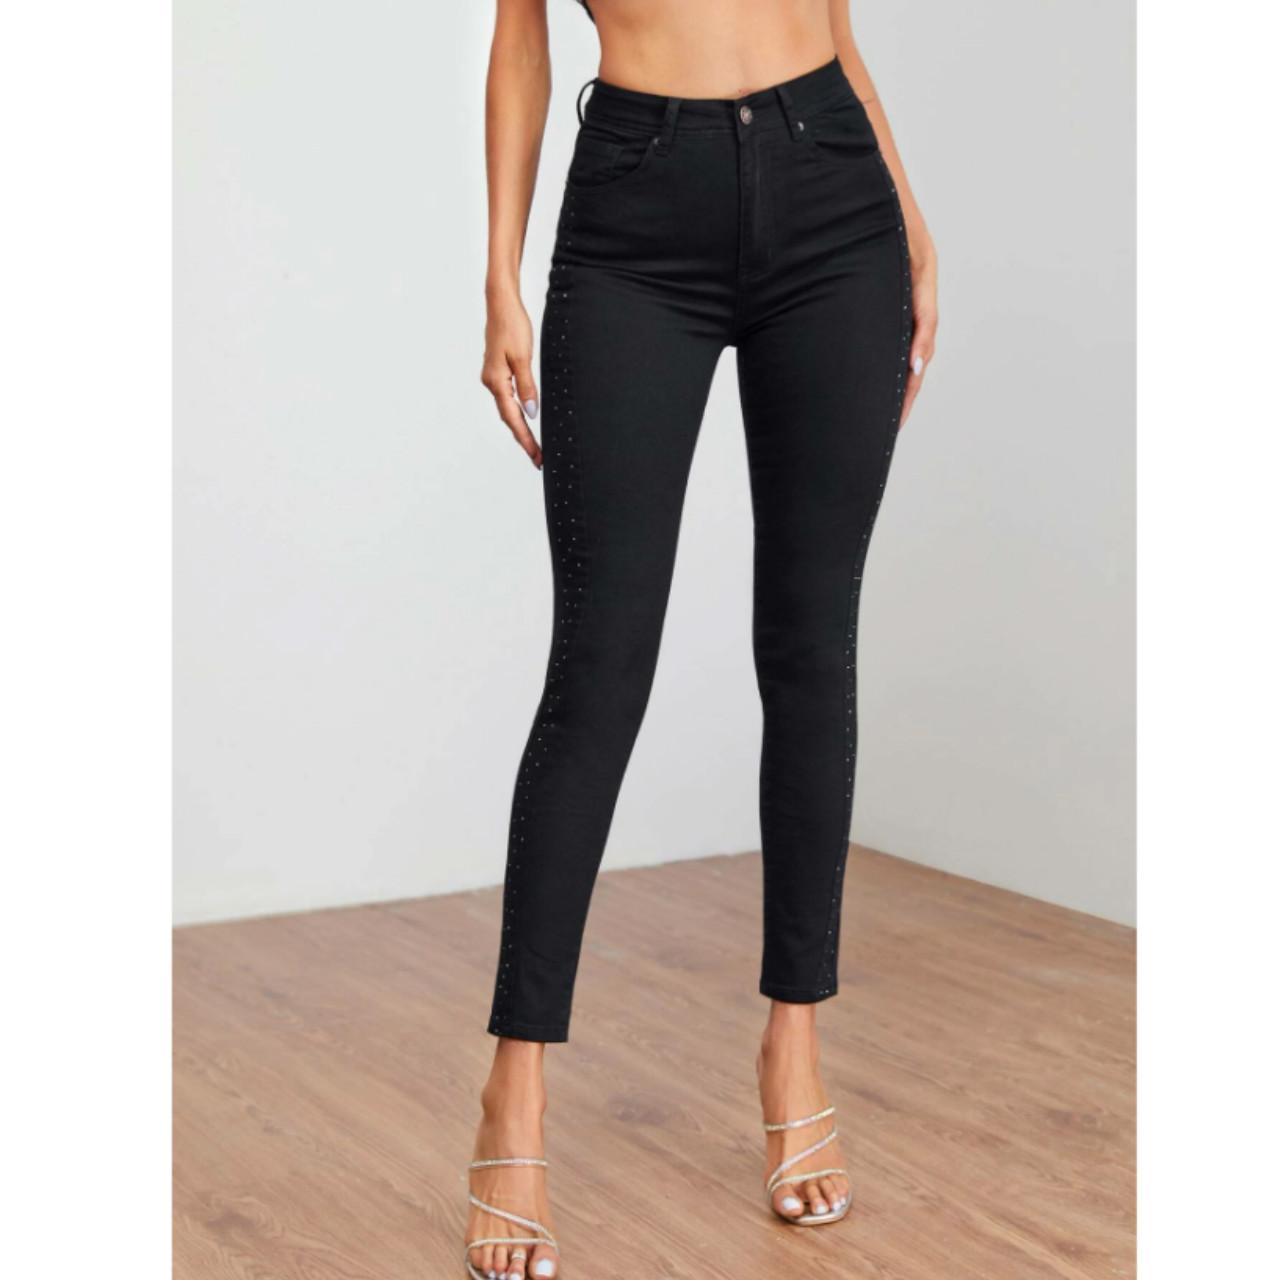 Rhinestone detail skinny jeans s